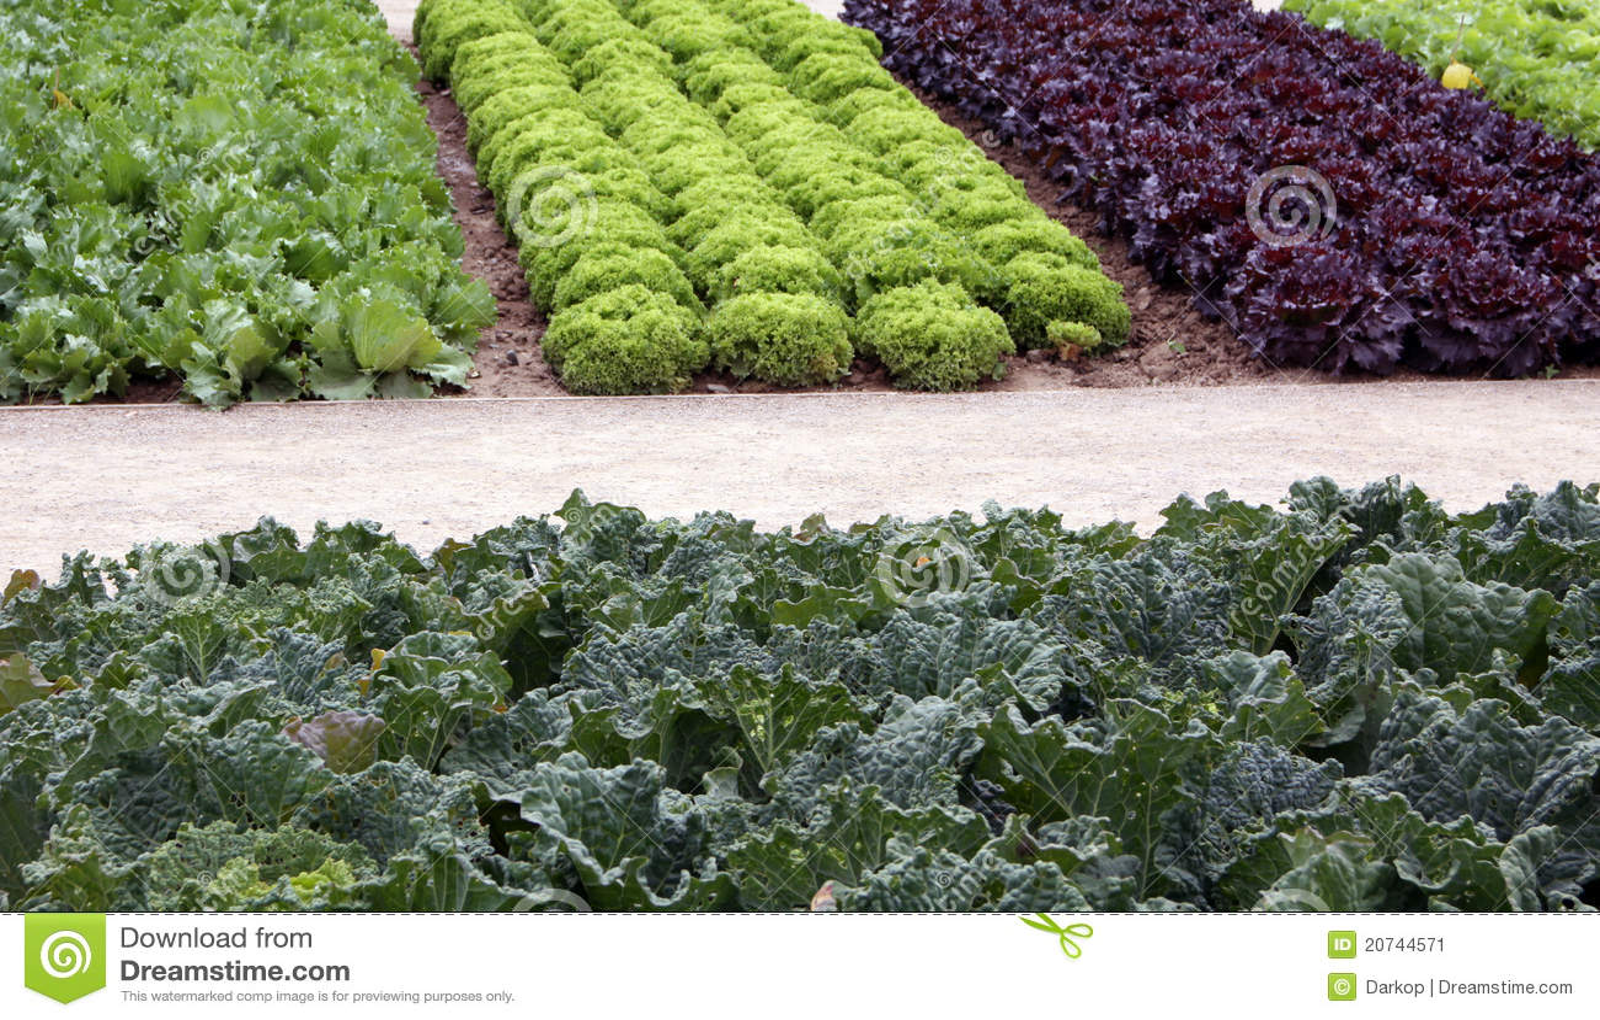 vegetable garden beds with salad and cale stock image. Black Bedroom Furniture Sets. Home Design Ideas